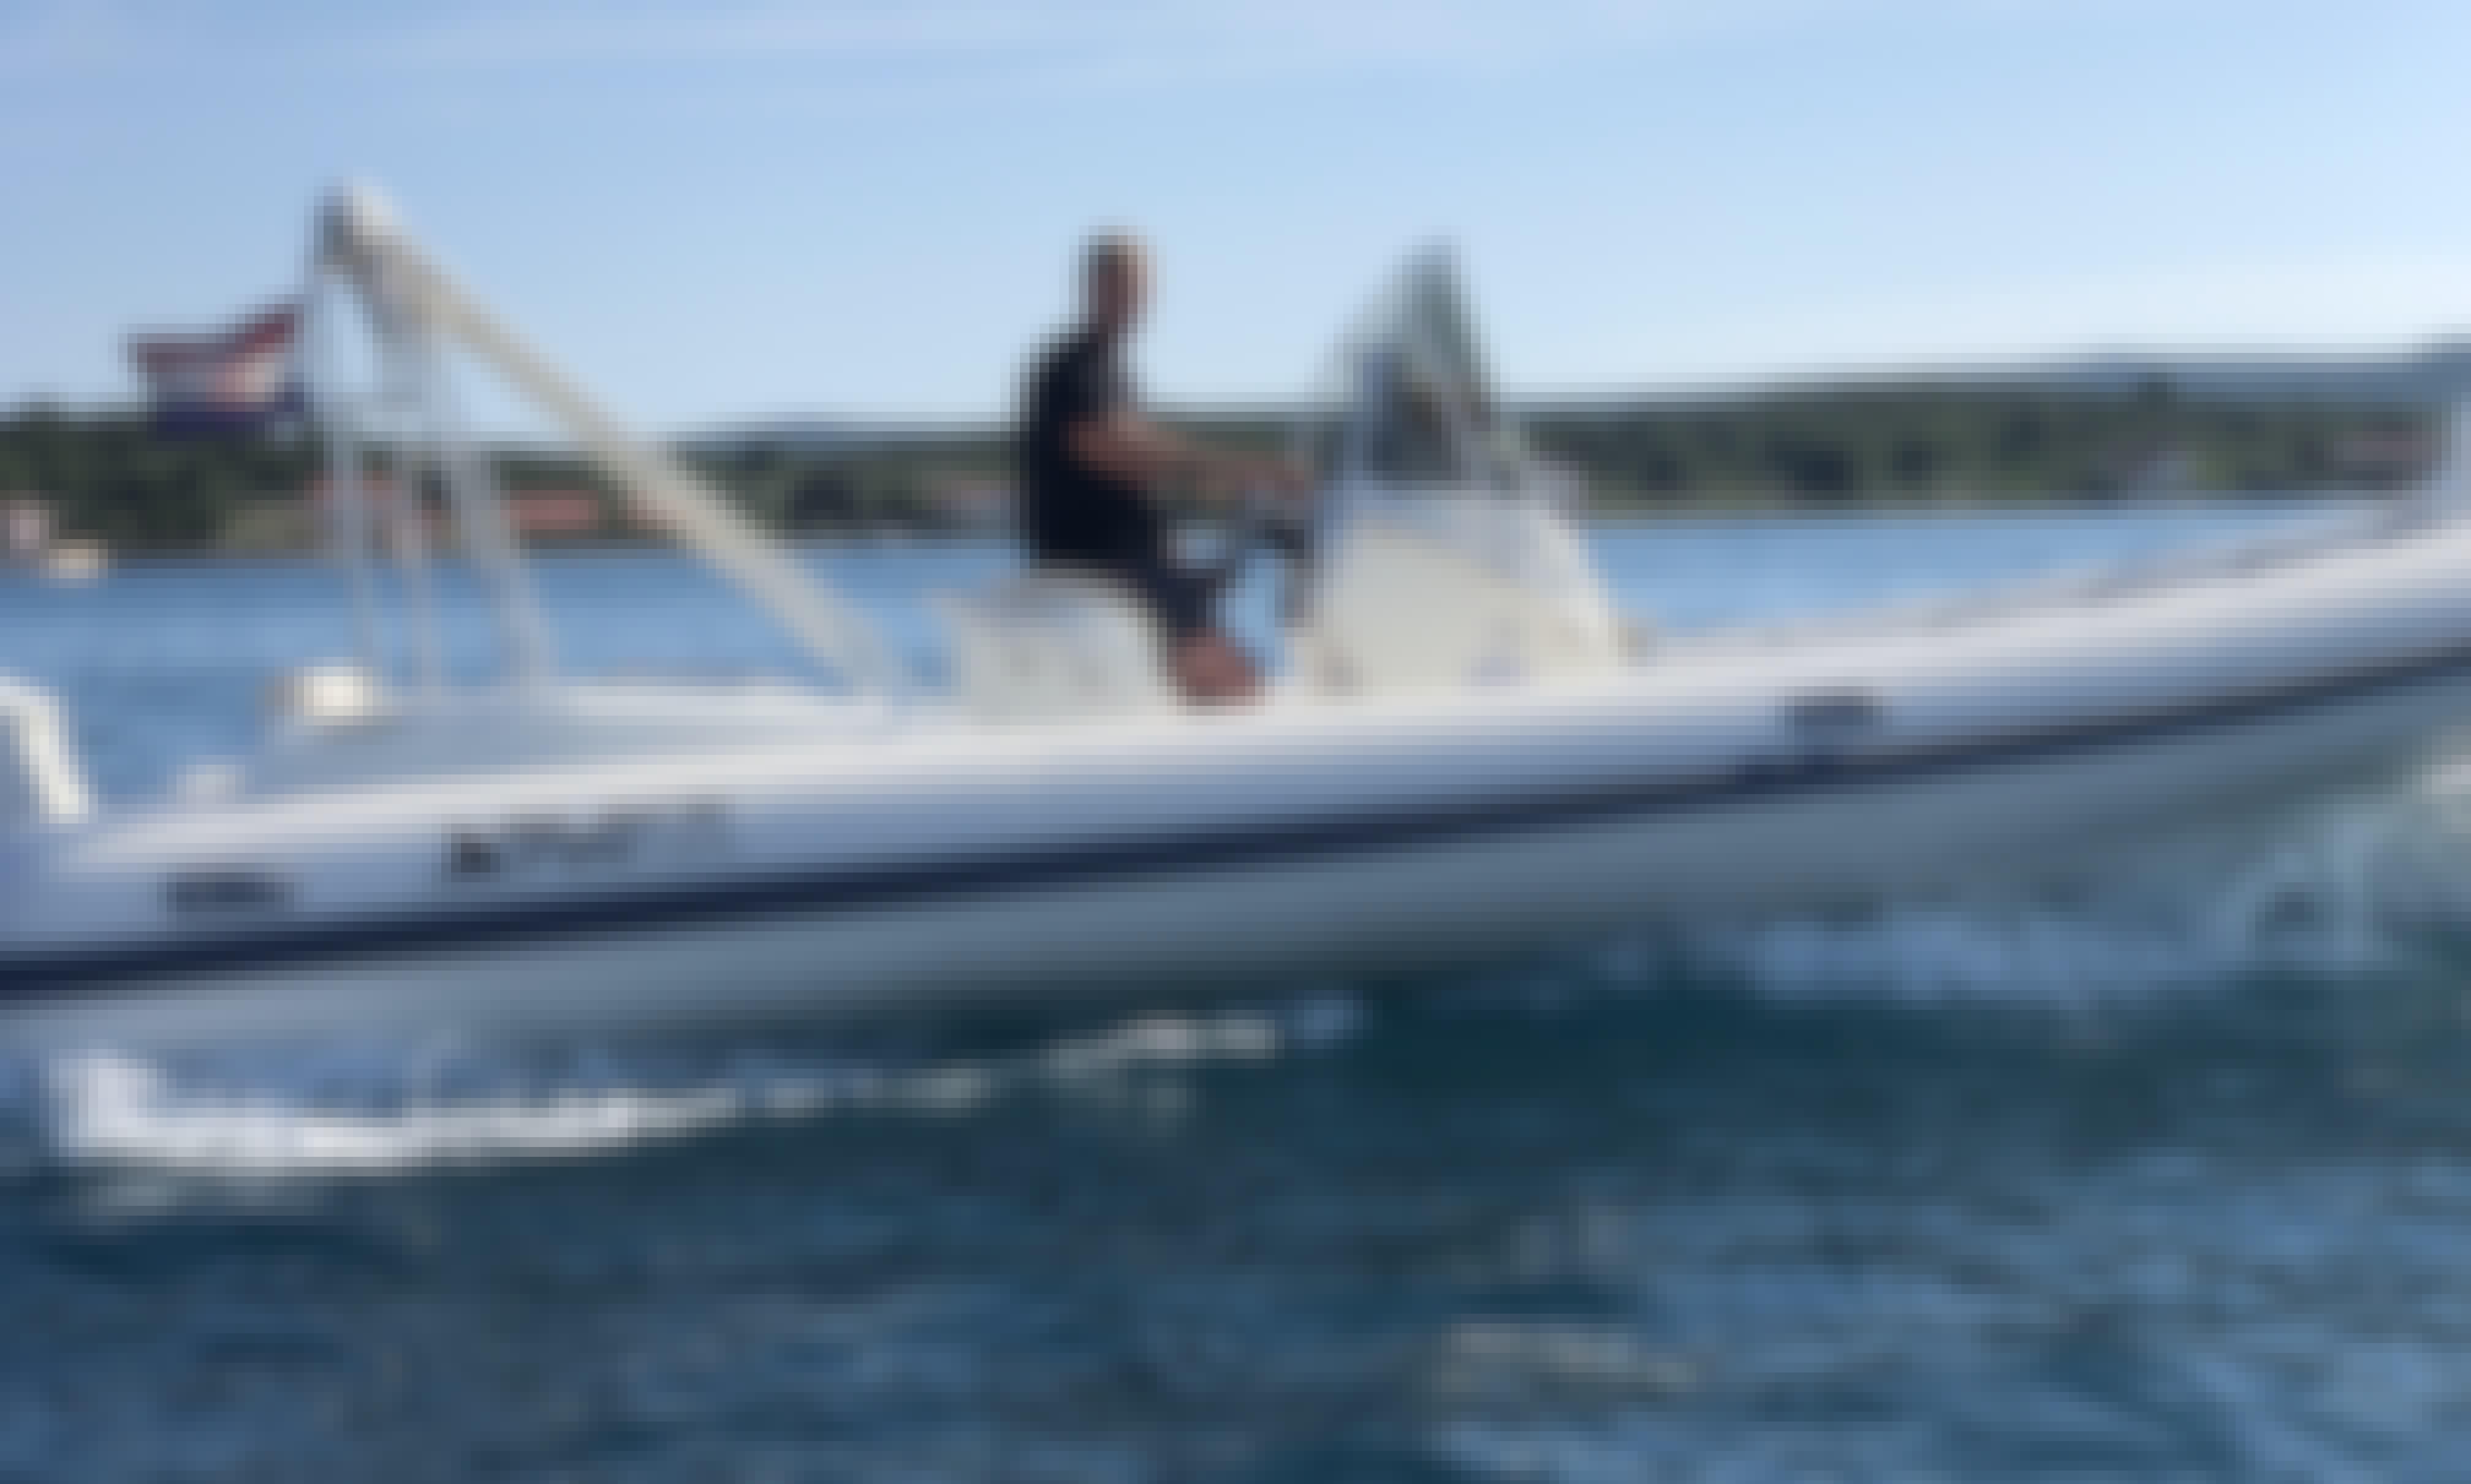 Nuova Jolly Blackfin 25 RIB with Evinrude 250 Outboard Motor in Biograd na Moru